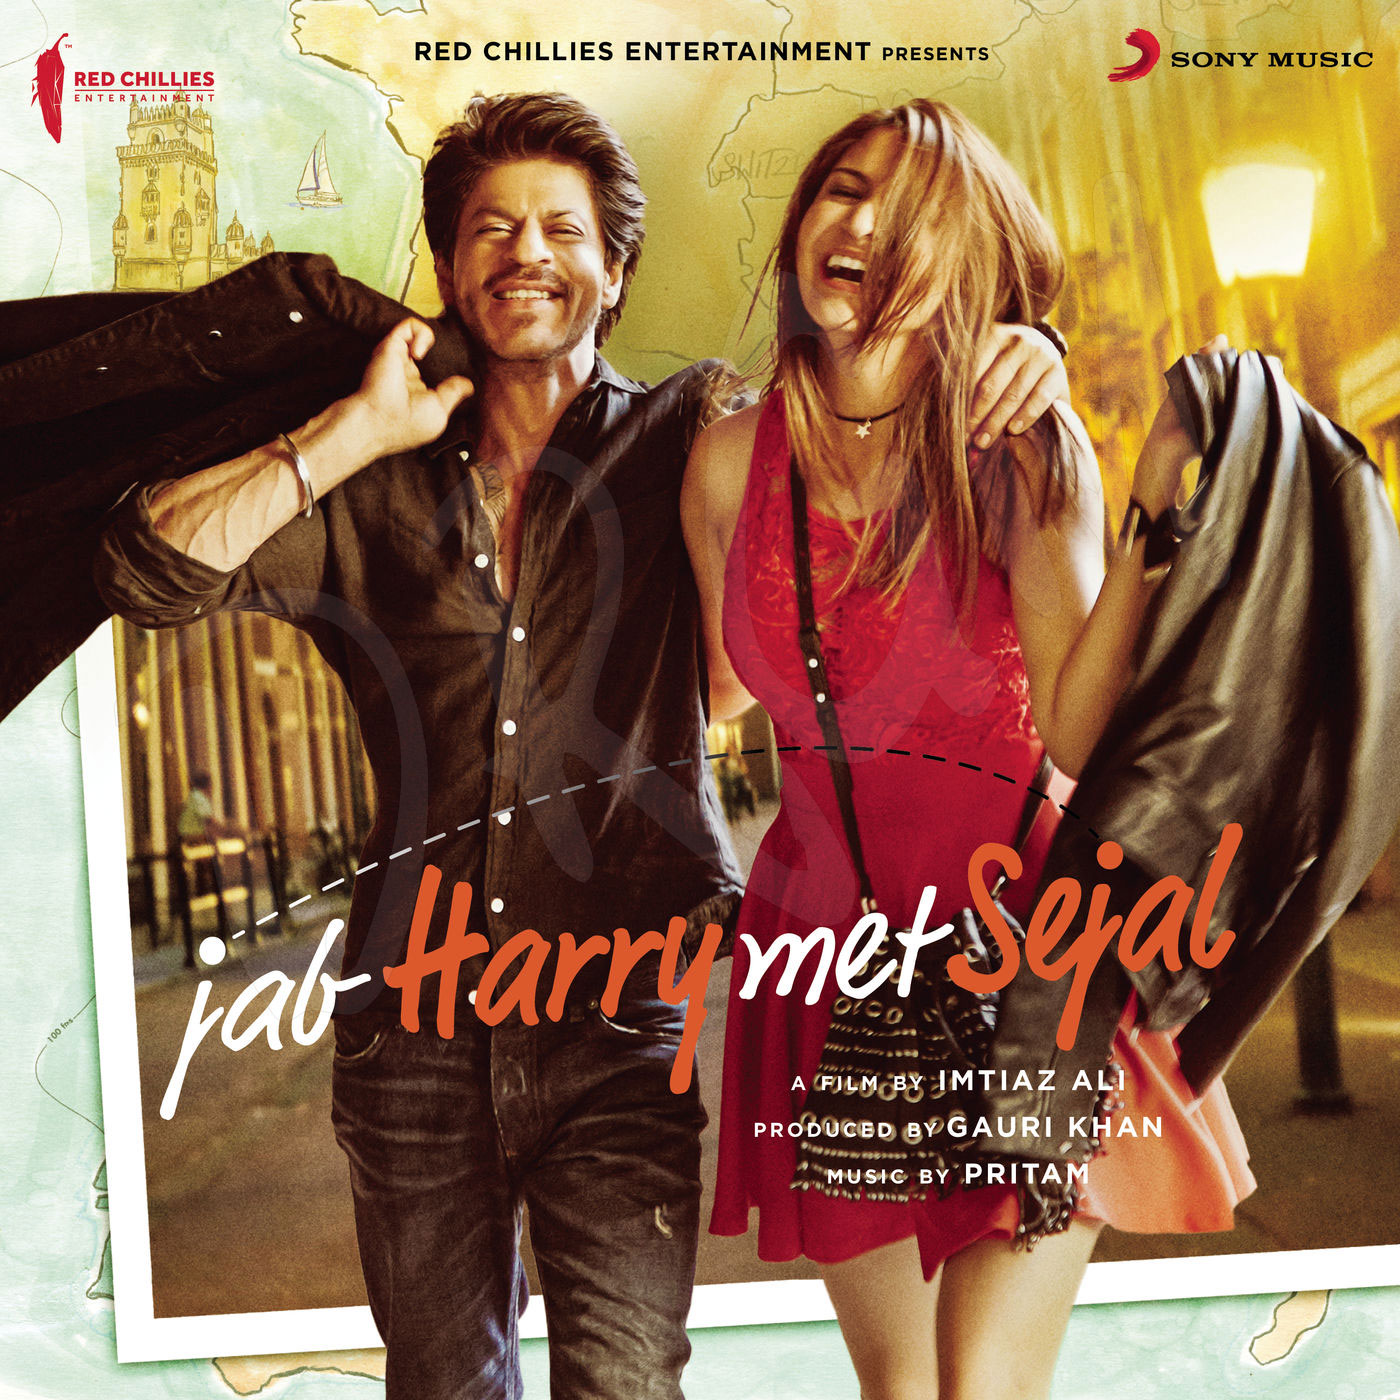 Jab-Harry-Met-Sejal-(2017)-Original-Album-Front-Cover-Poster-wallpaper-New-HD